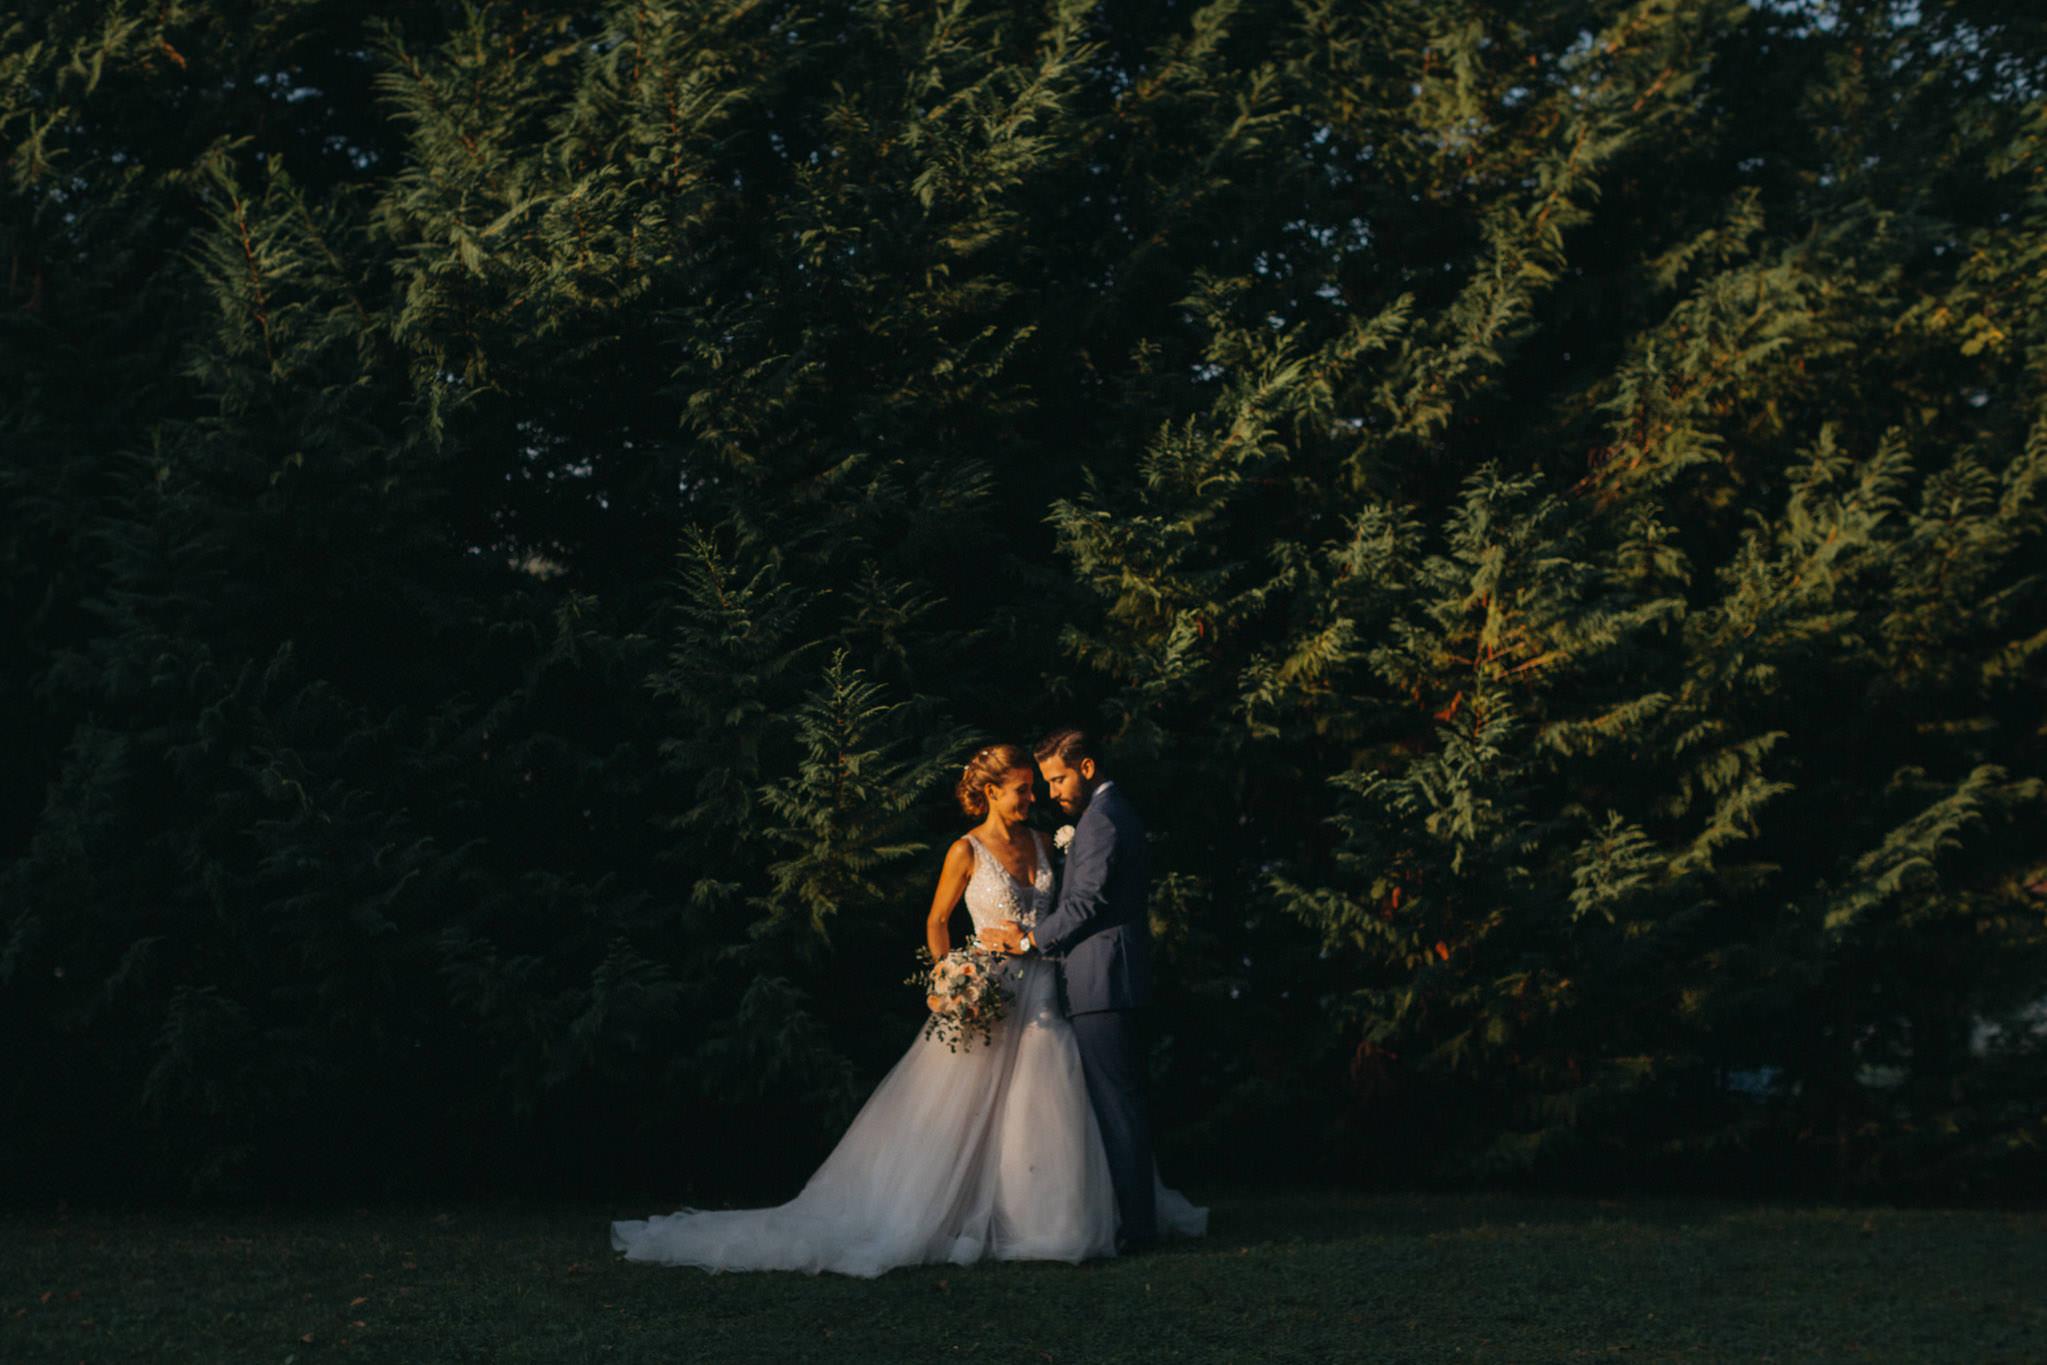 fotografia_di_matrimonio_portfolio-1116